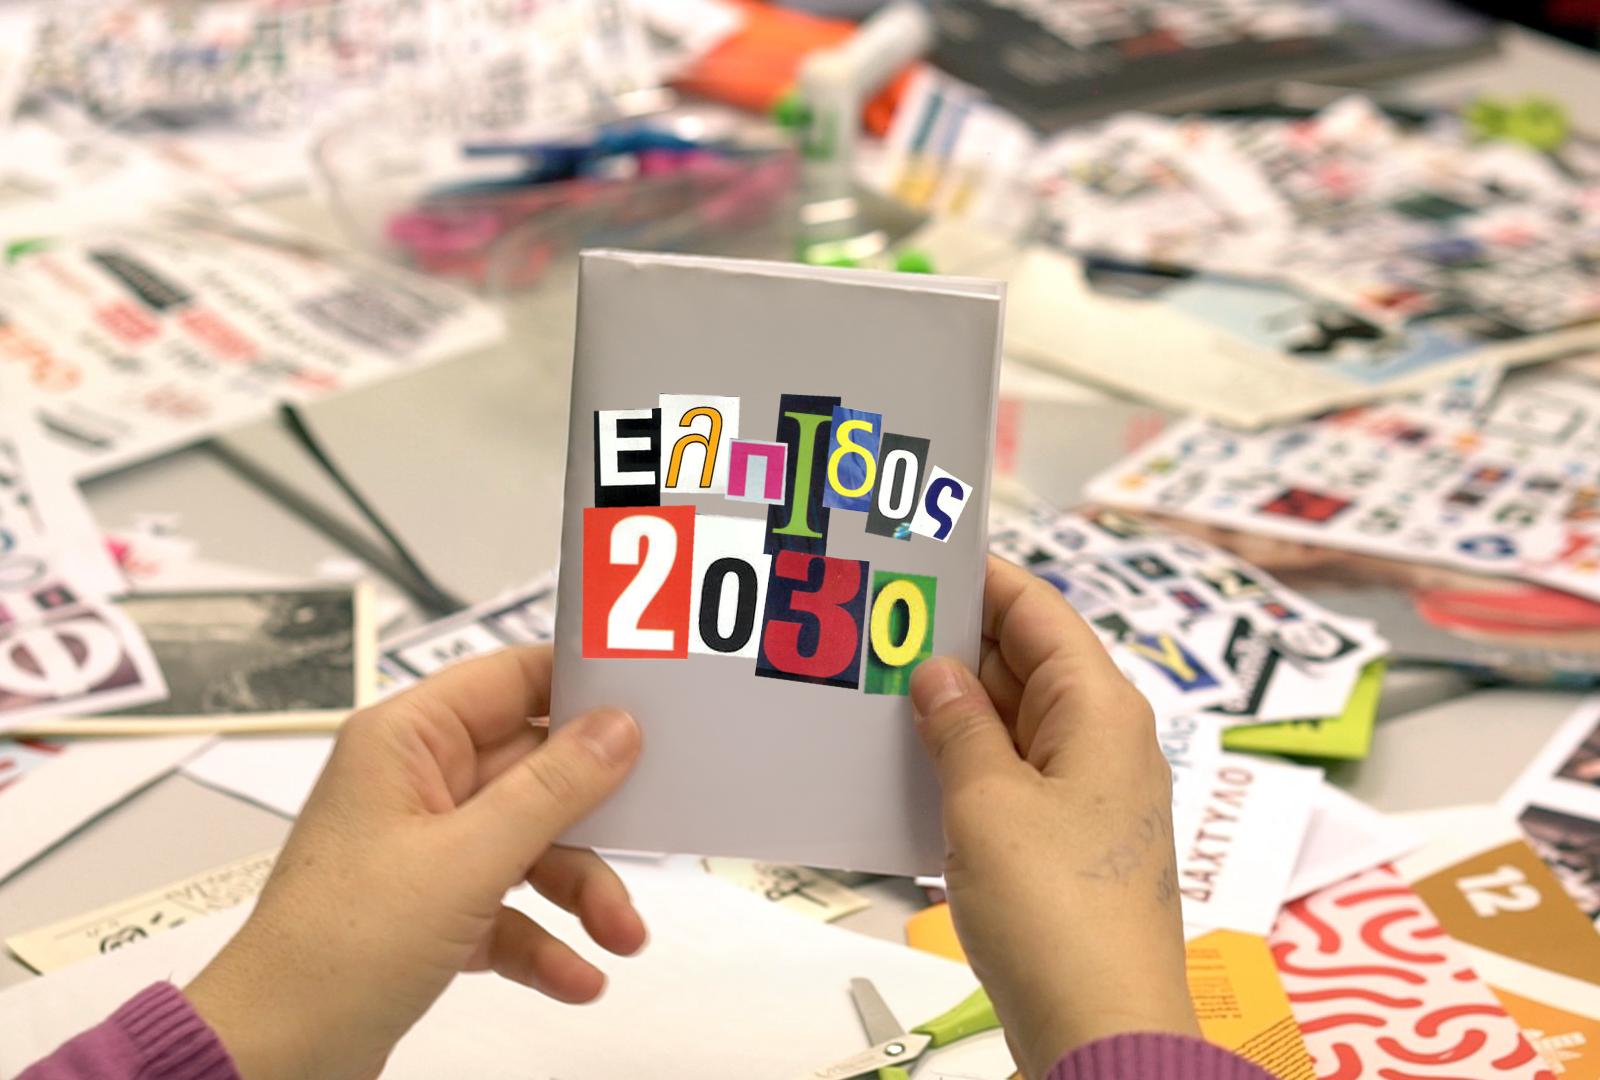 elpidos2030